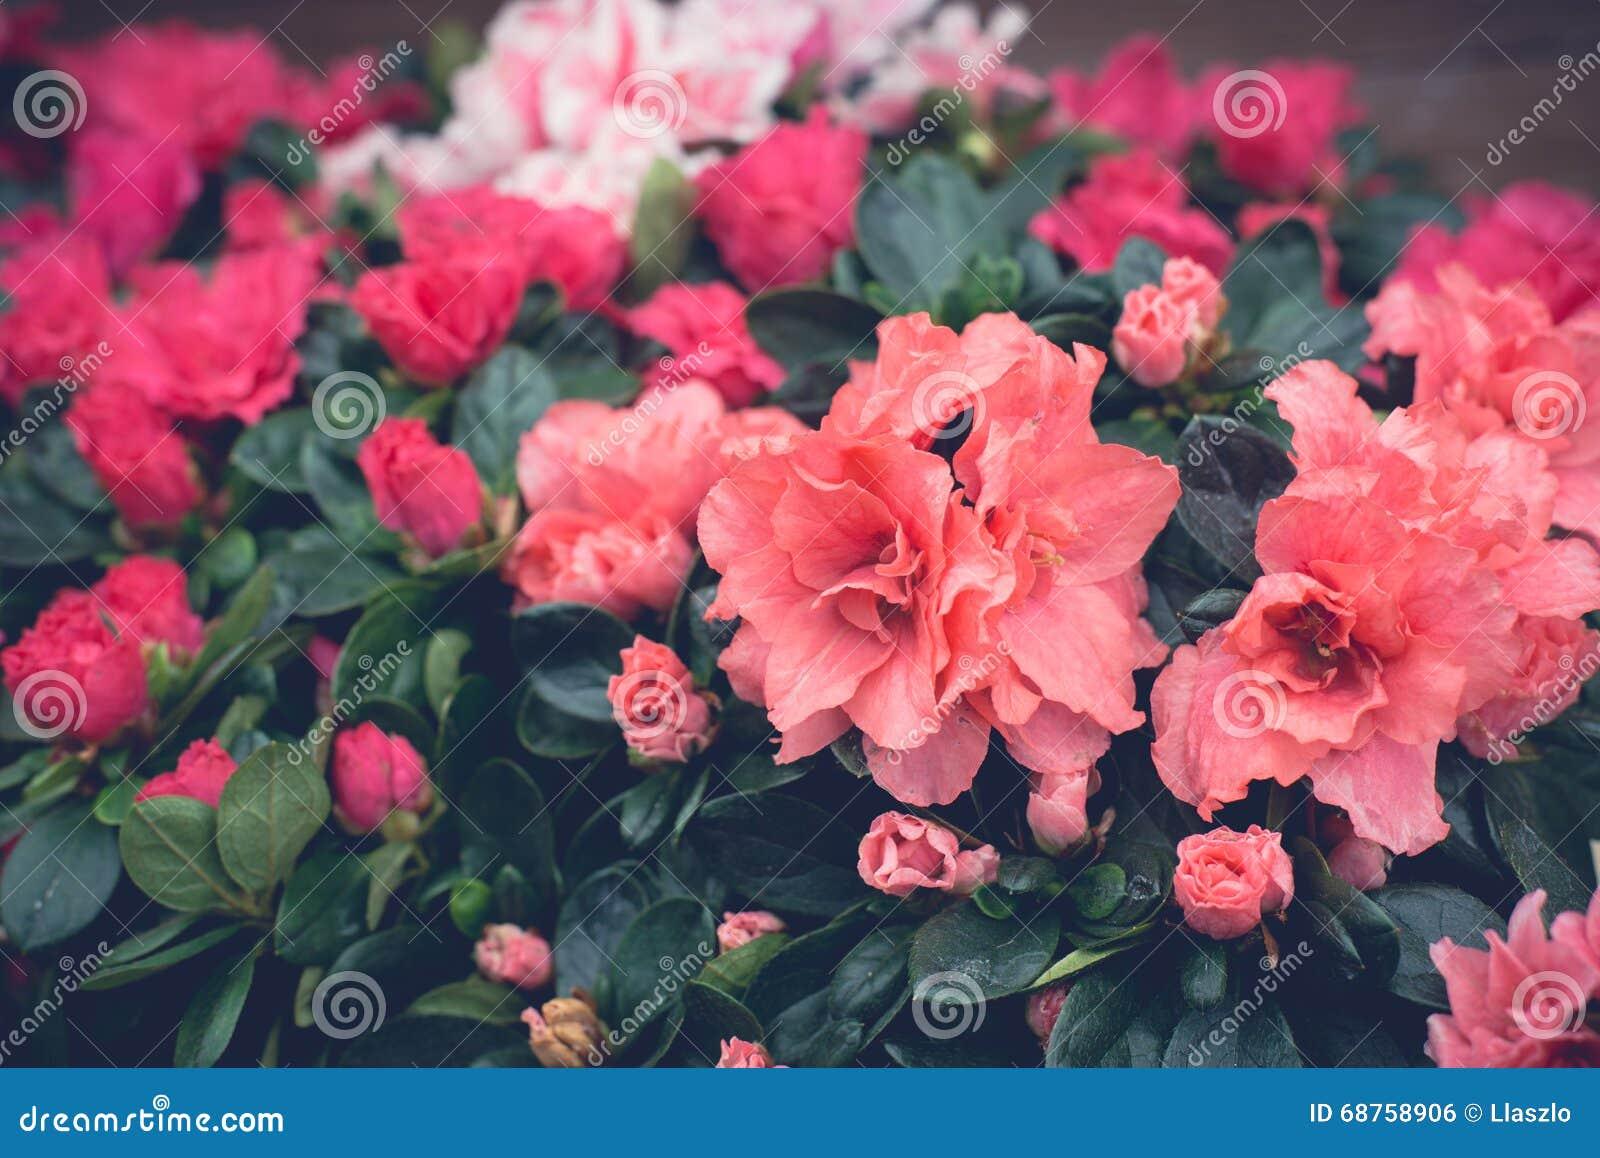 Pink Floral Wallpaper Stock Photo Image Of Dark Close 68758906